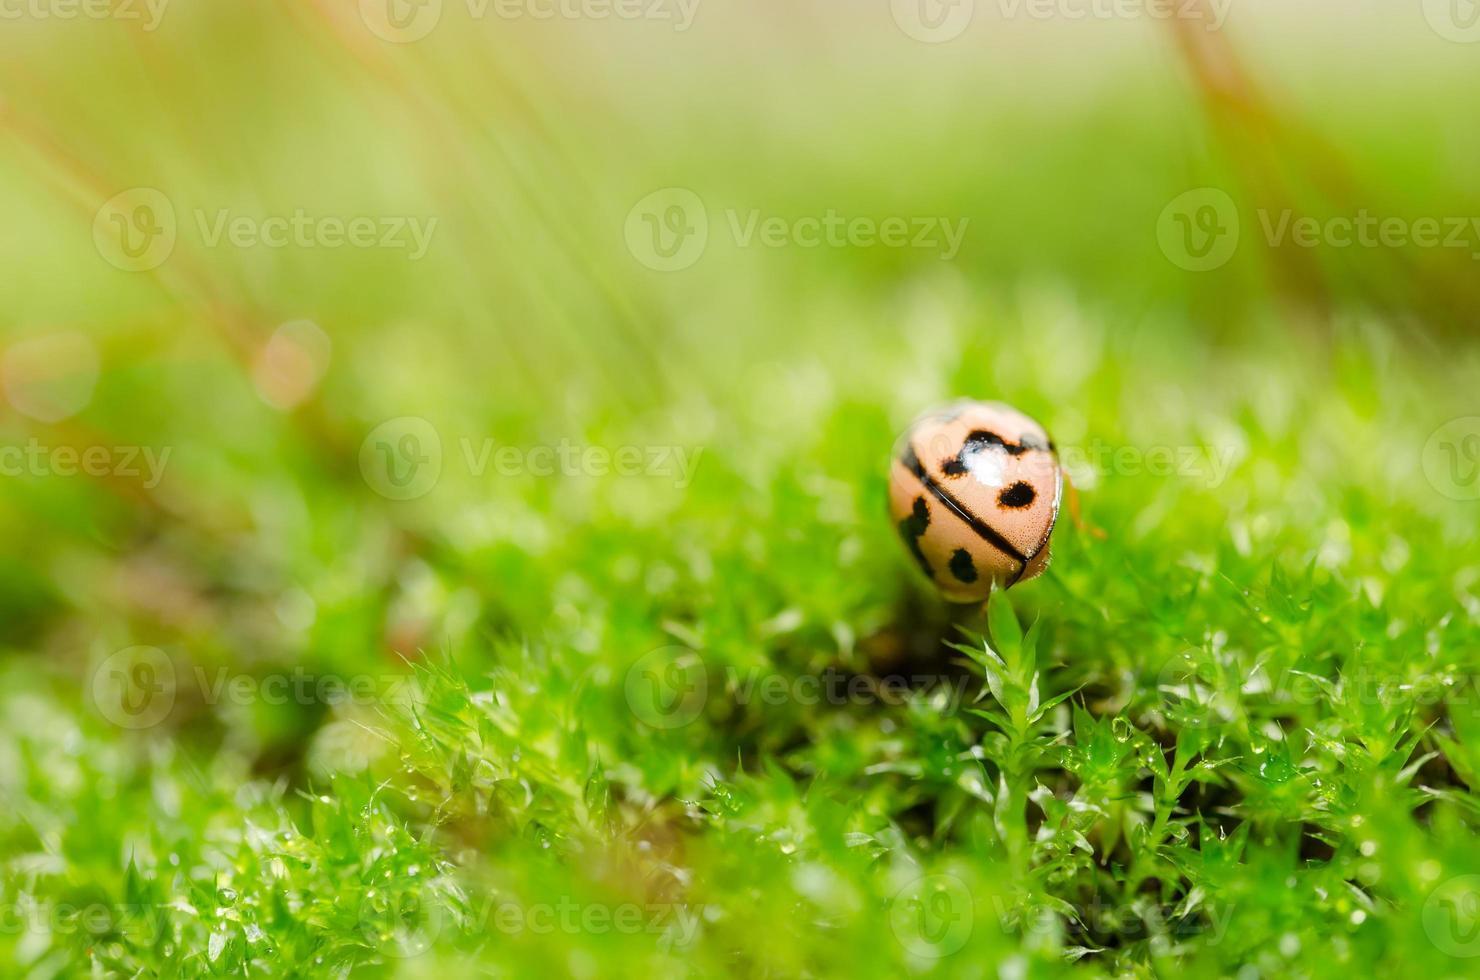 ladybug in green nature photo